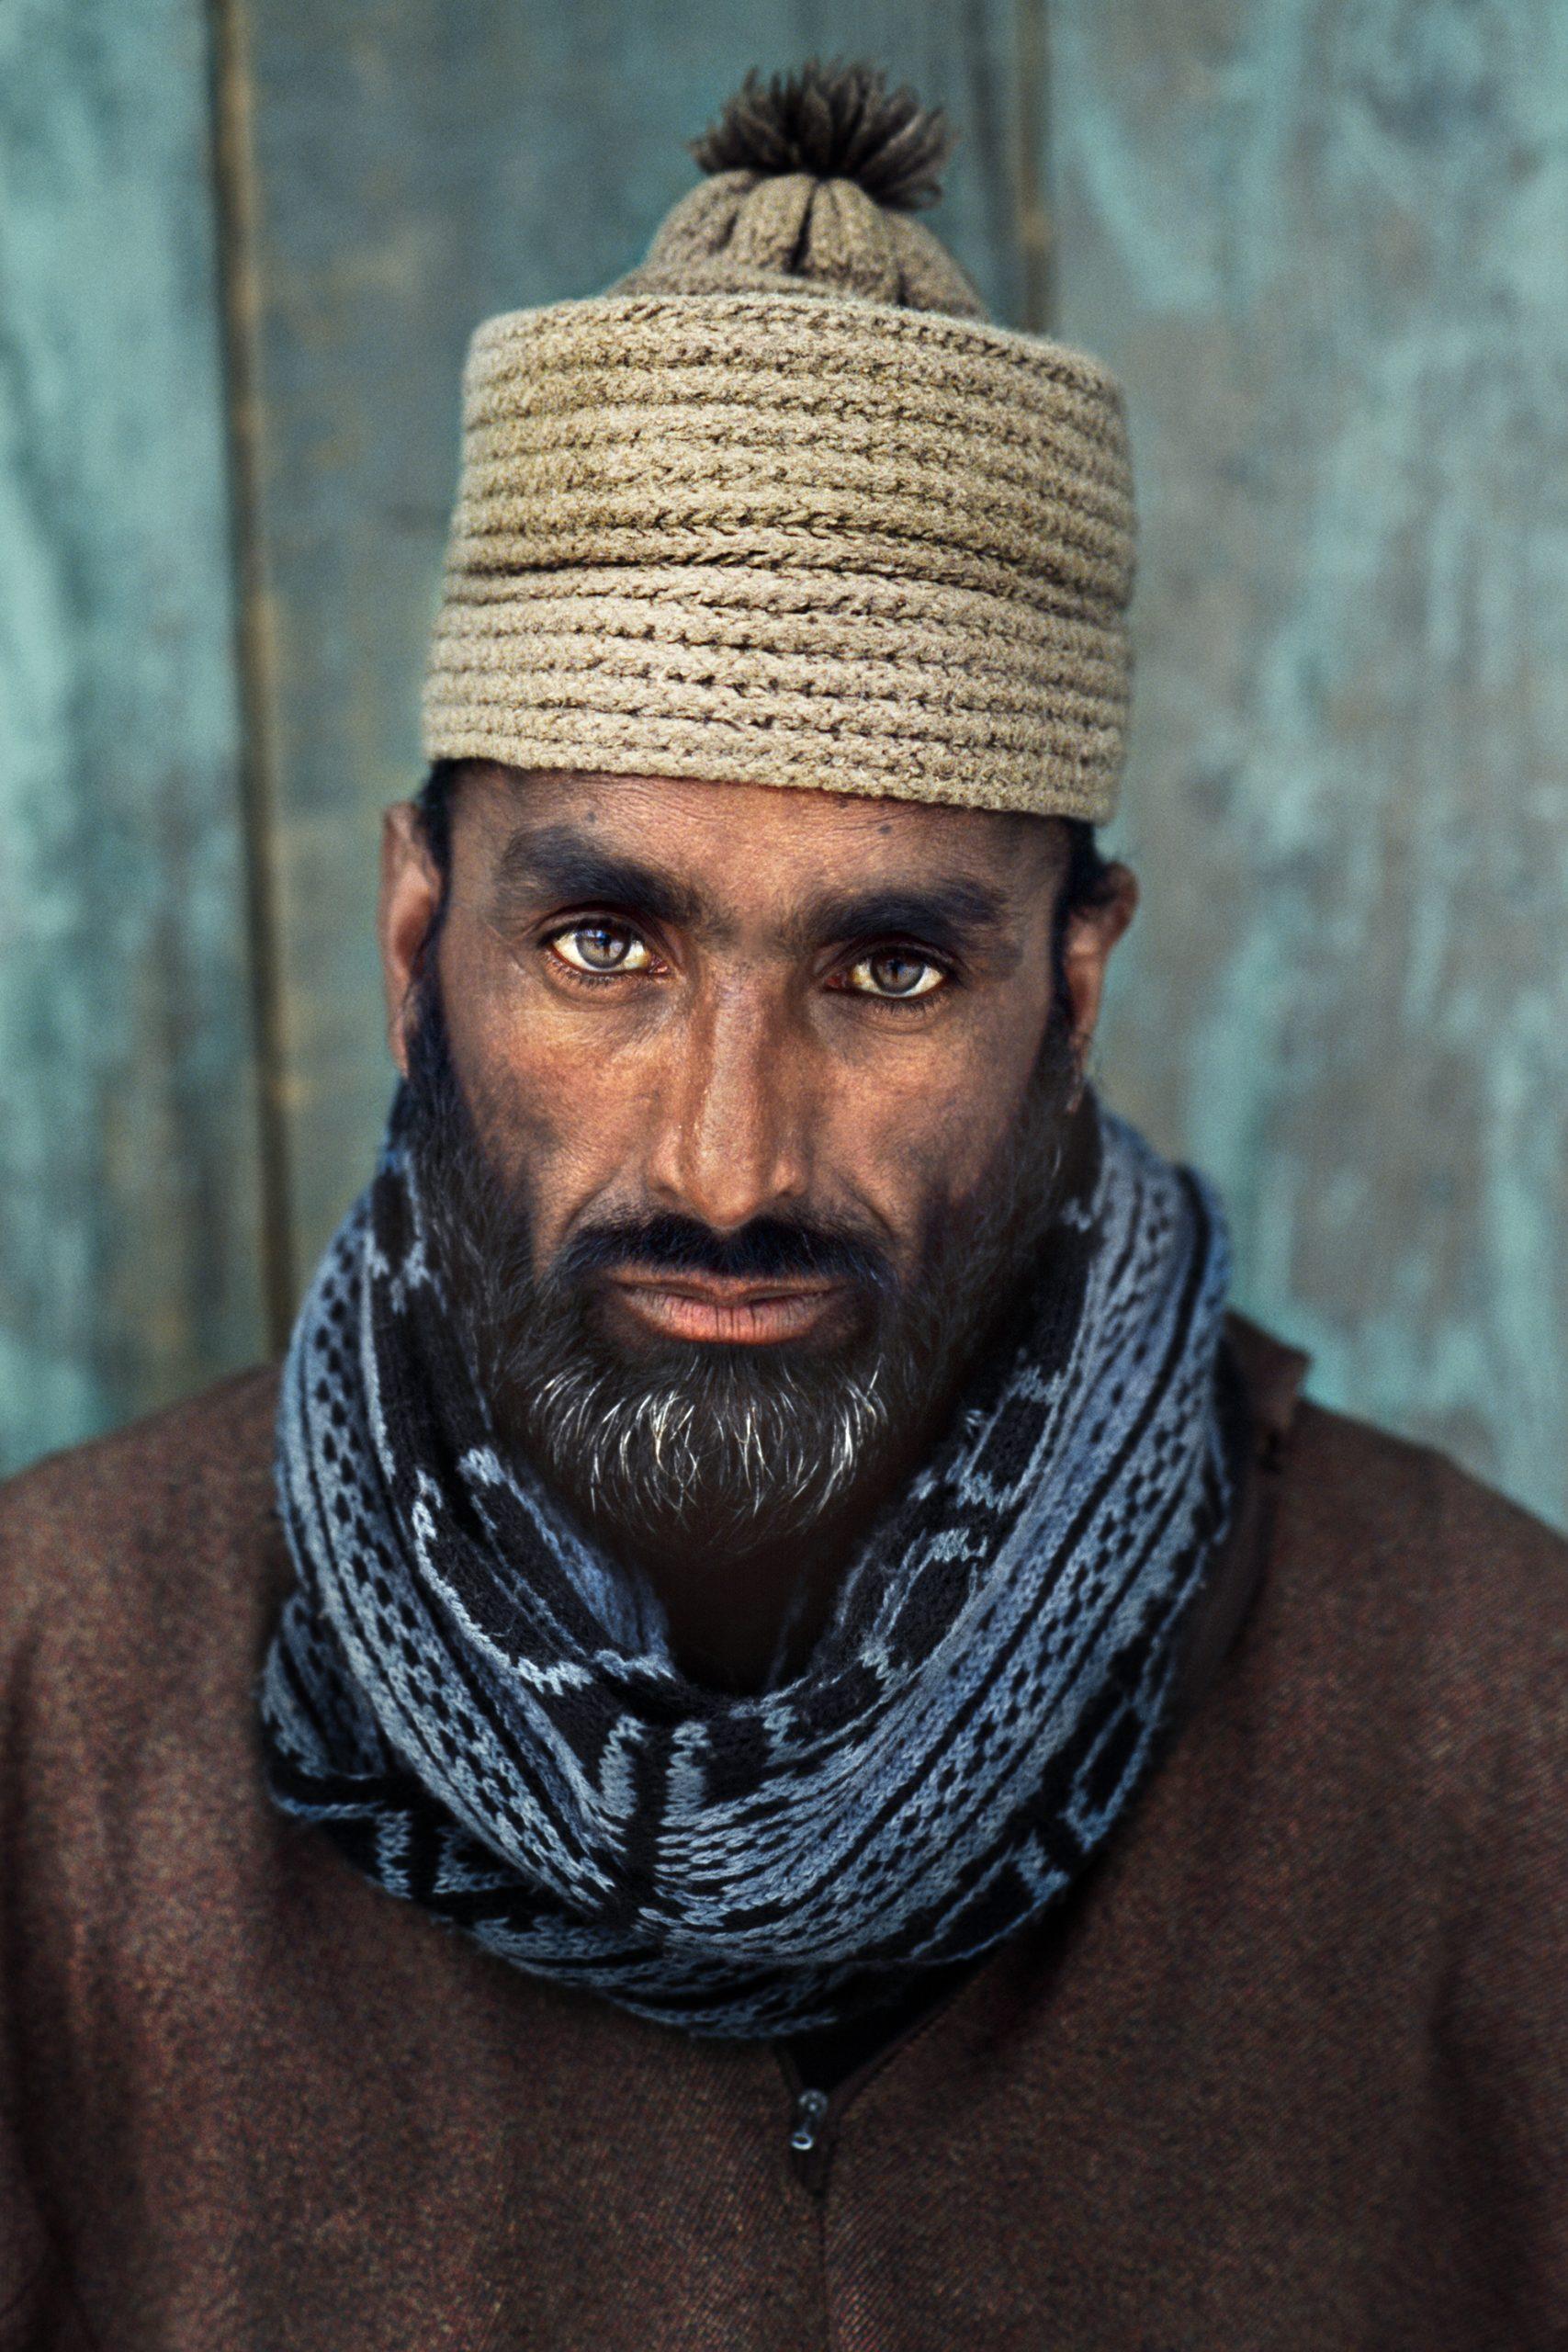 Steve McCurry, Kashmir, portrait, man